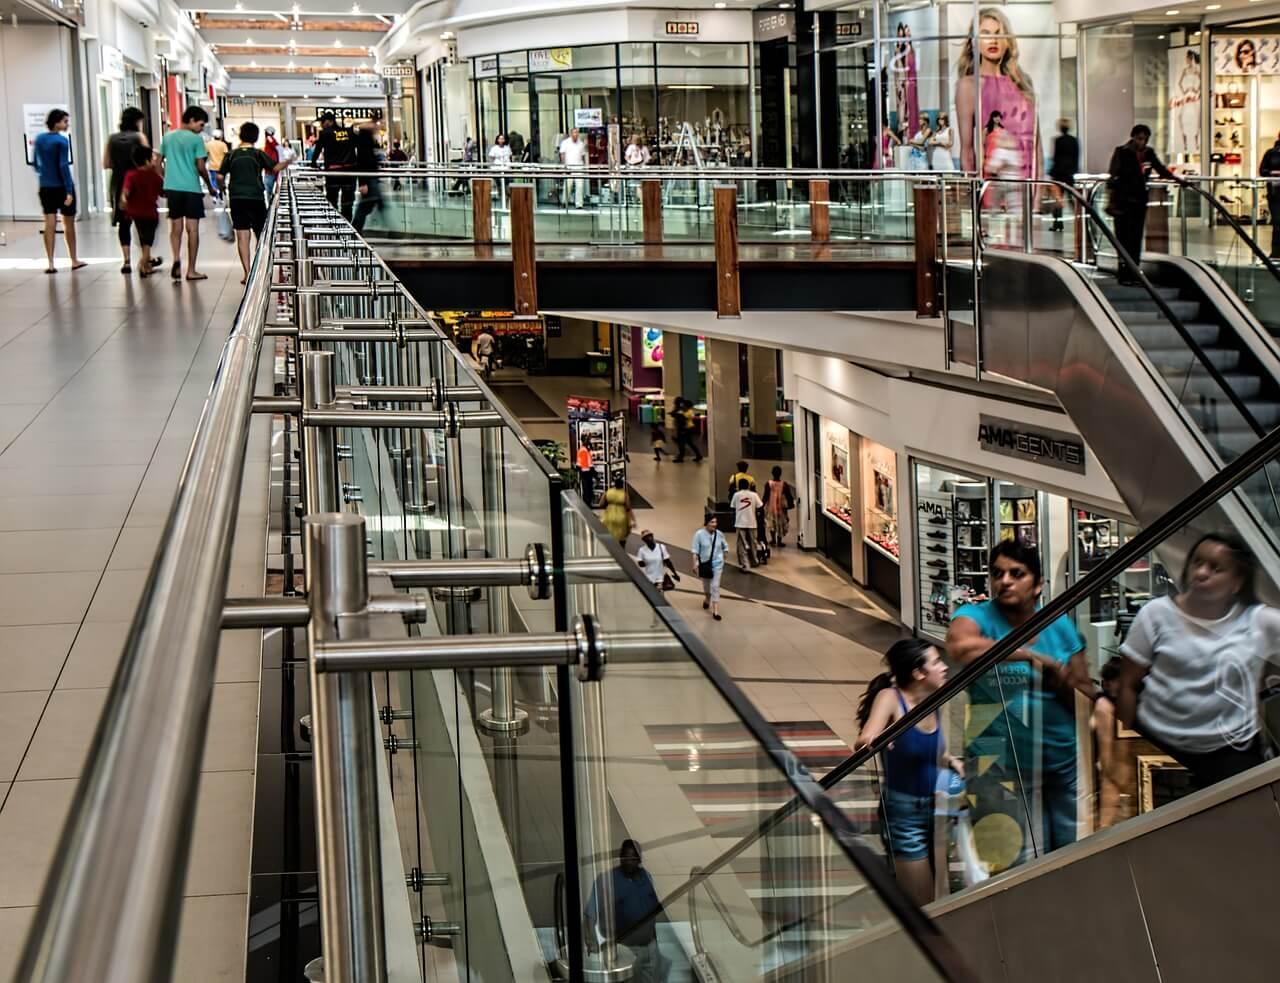 retailnew2 - Pot brands race to claim retail dominance in budding marijuana landscape